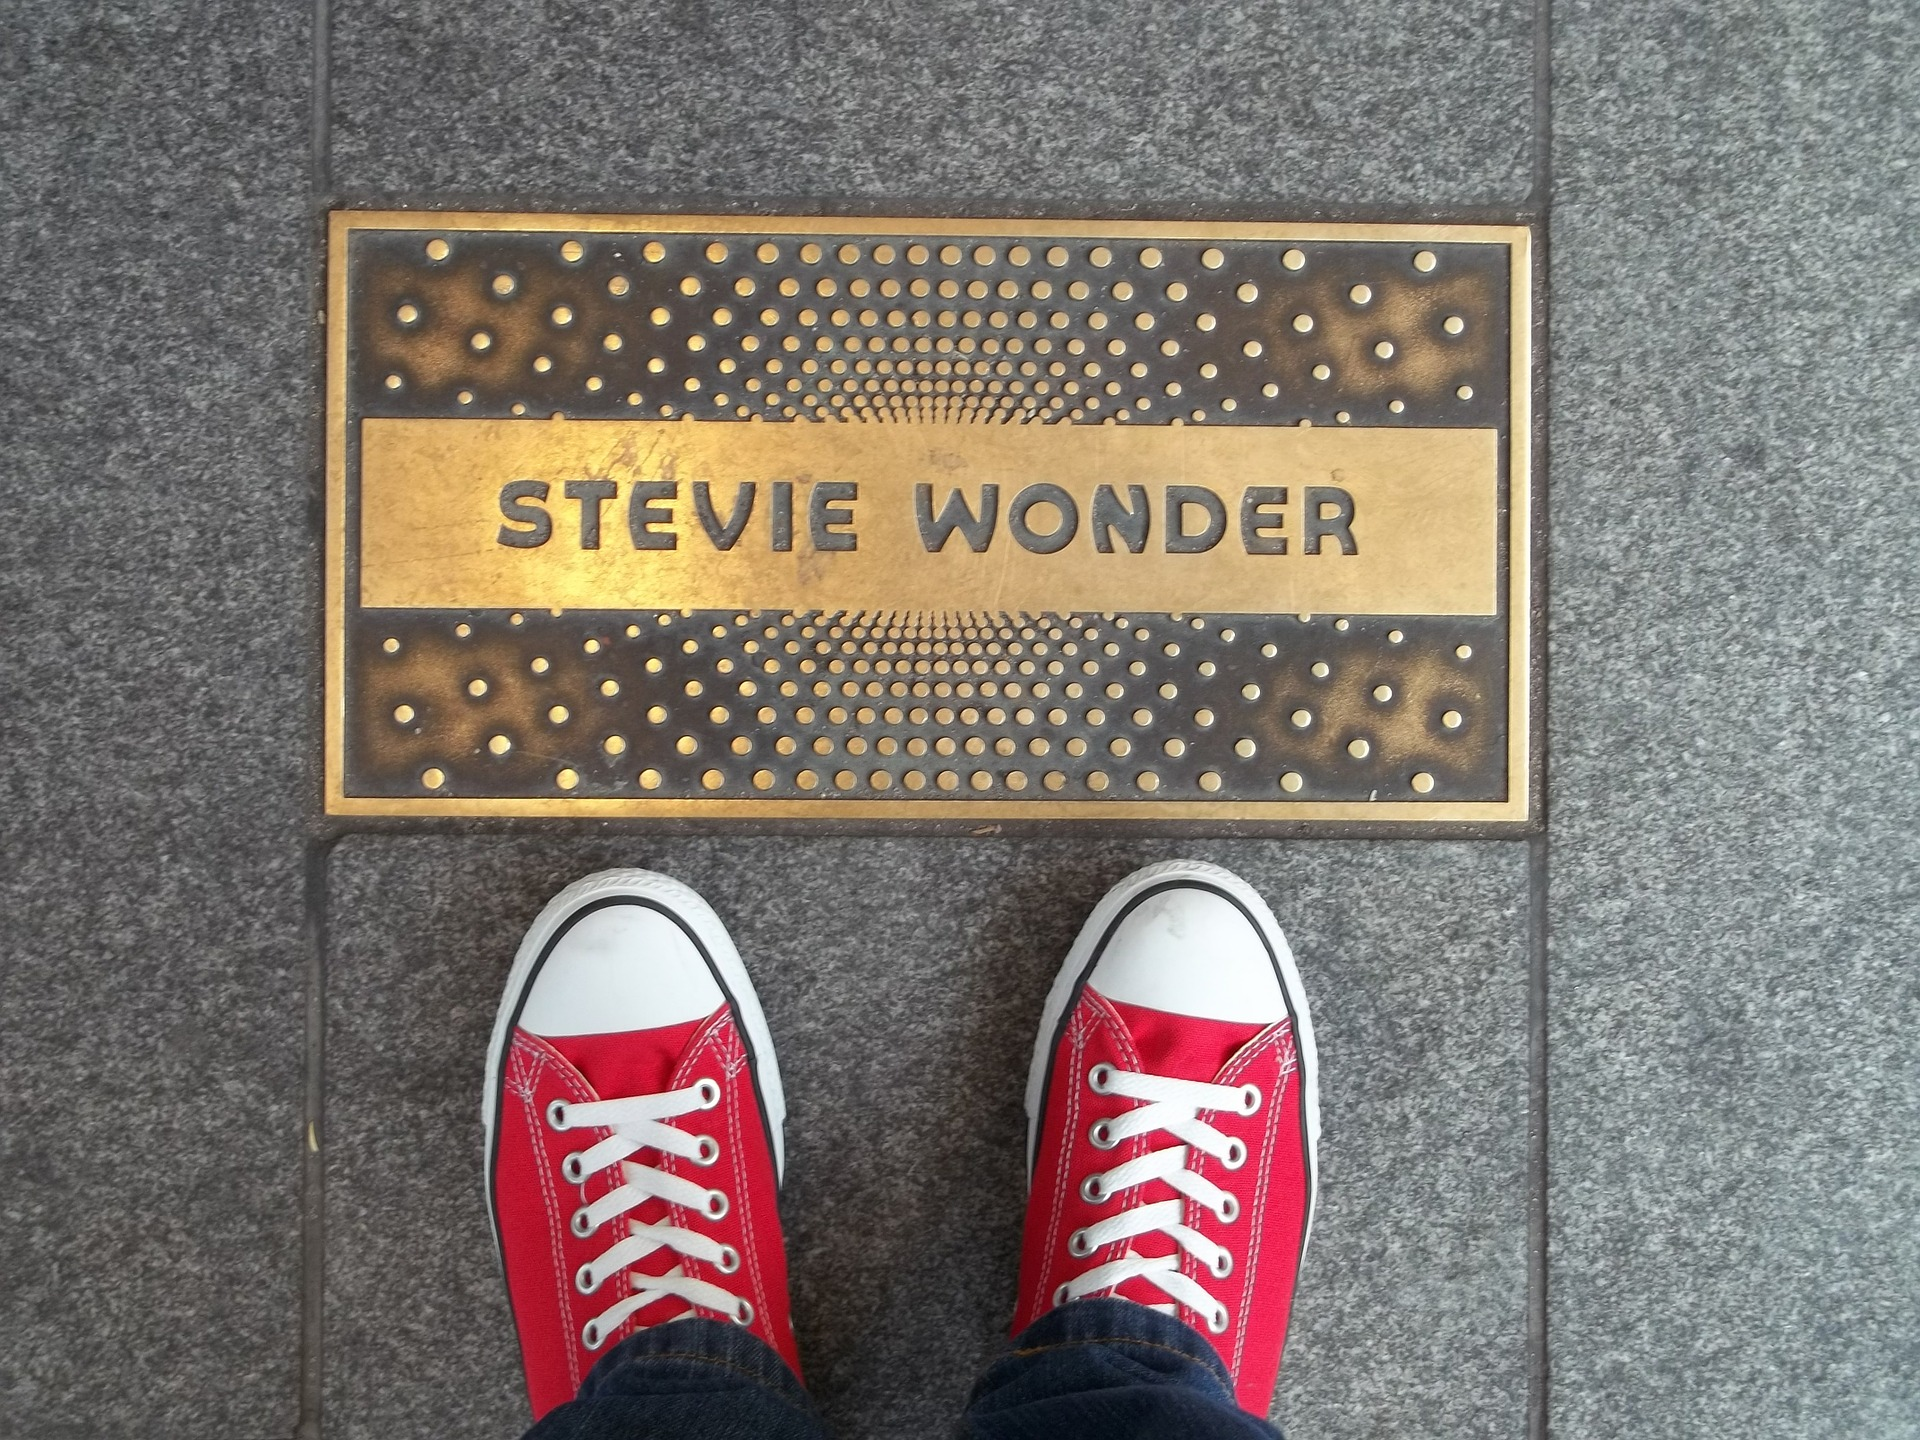 stevie wonder walk of fame, walk of fame